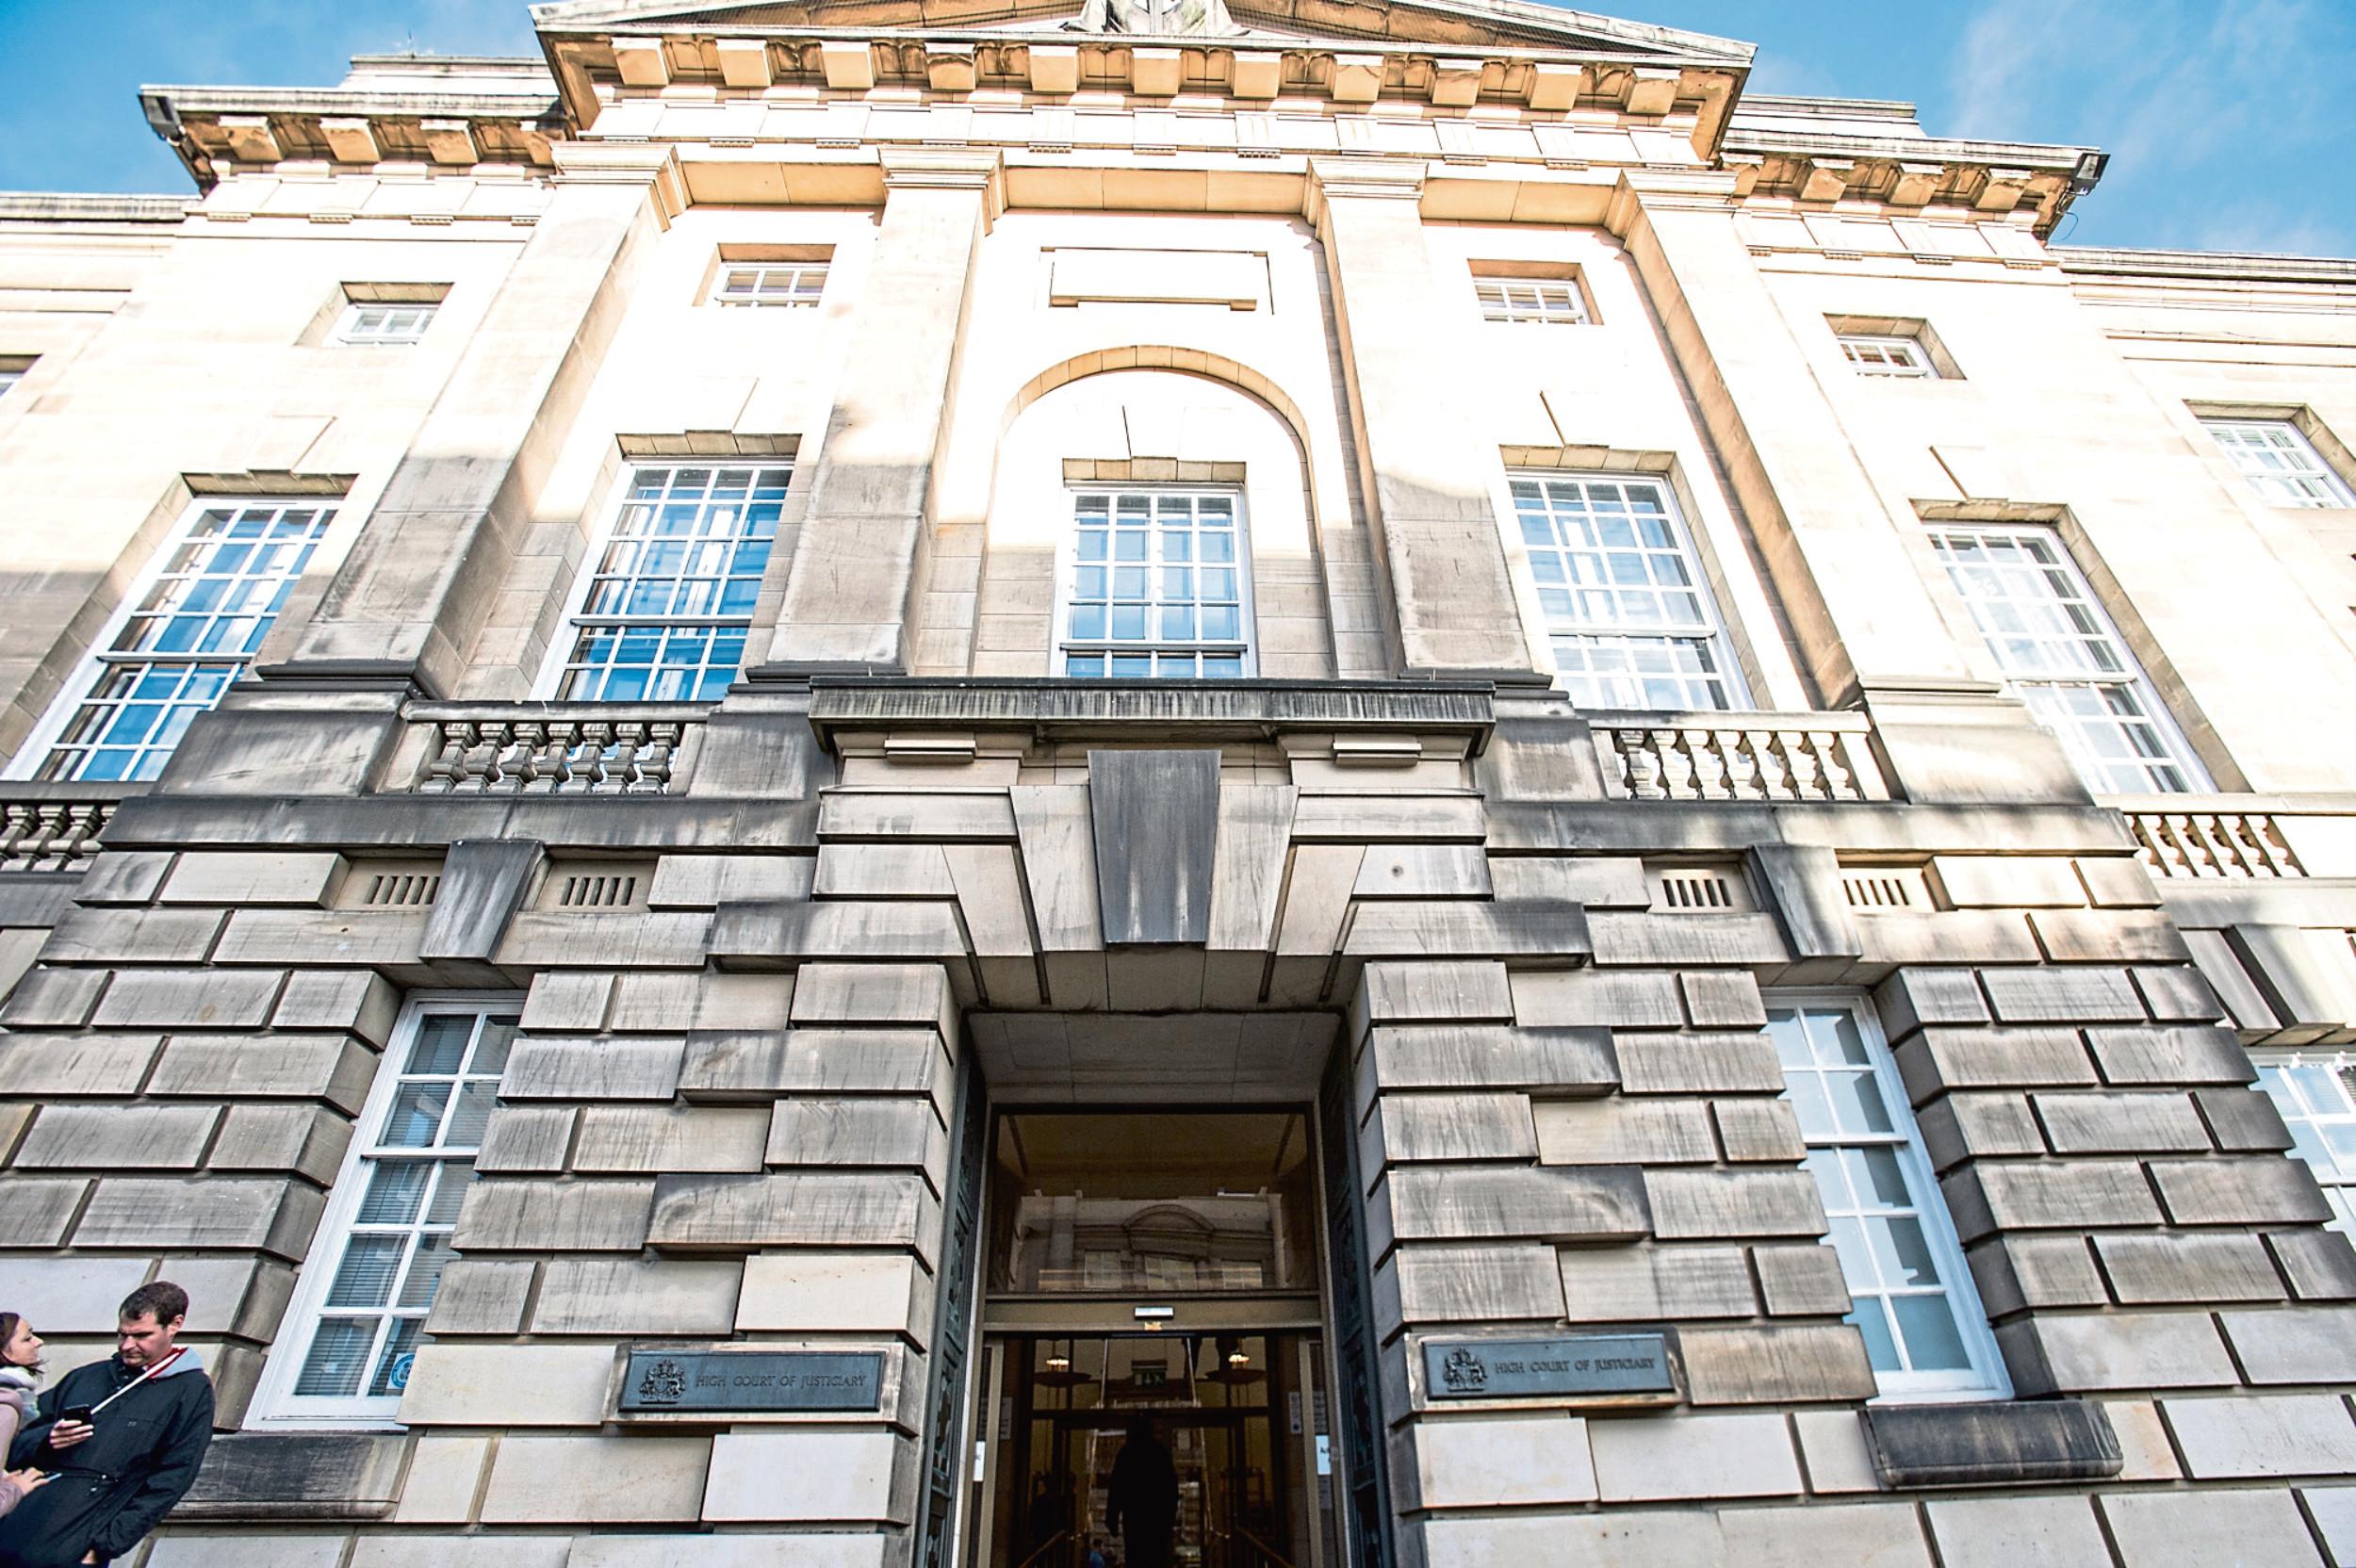 The High Court in Edinburgh.